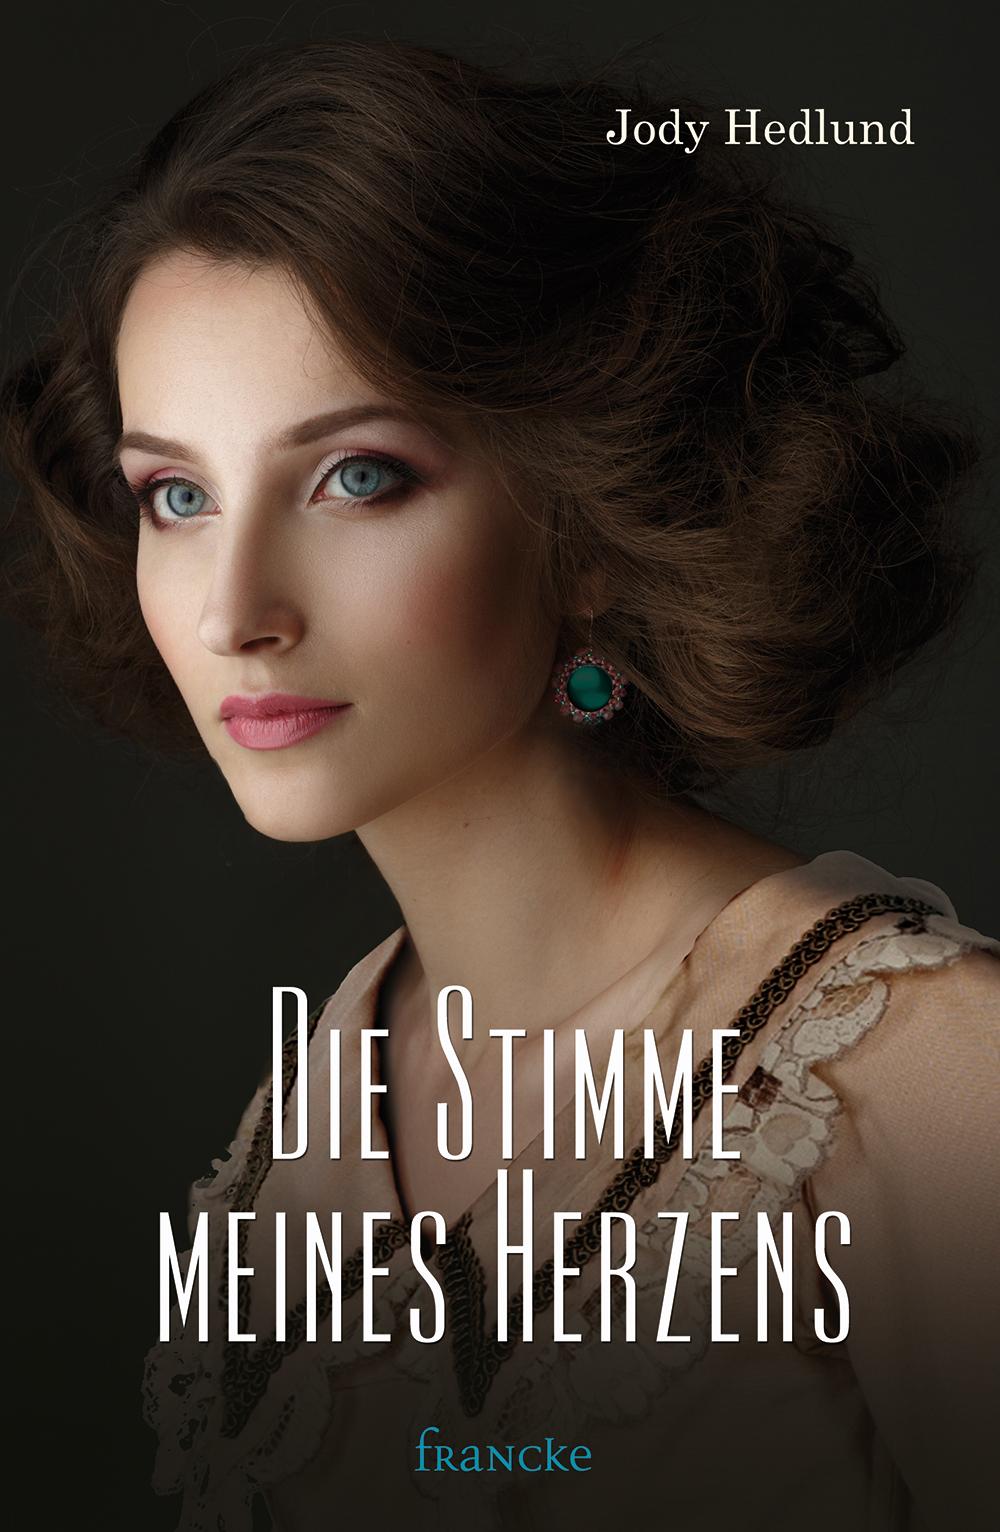 http://www.francke-buch.de/img/cover/print/1449667824-268134.jpg